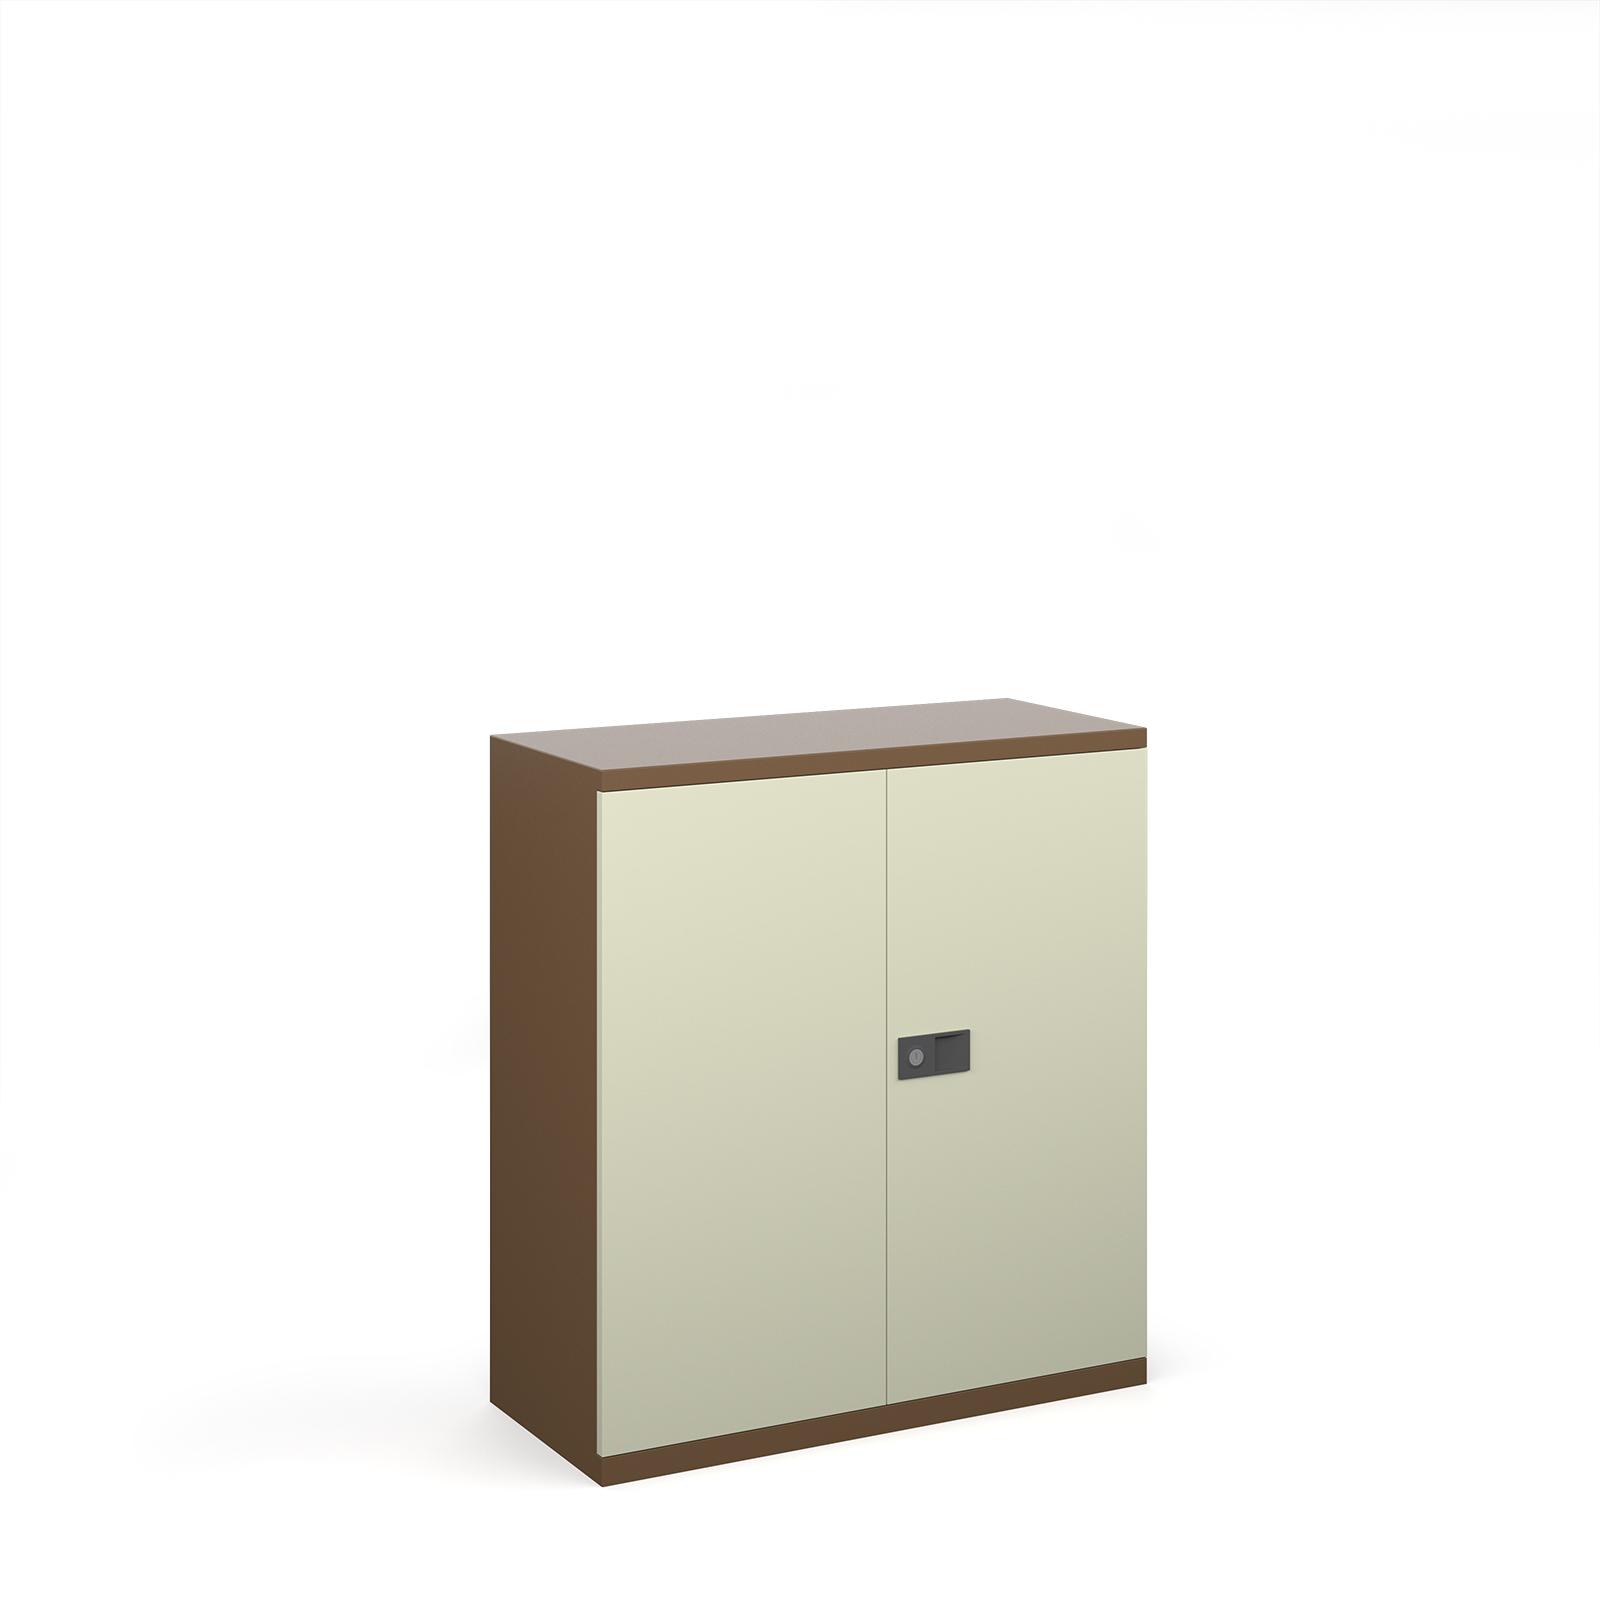 Cupboards / Lockers & Accessories Steel contract cupboard